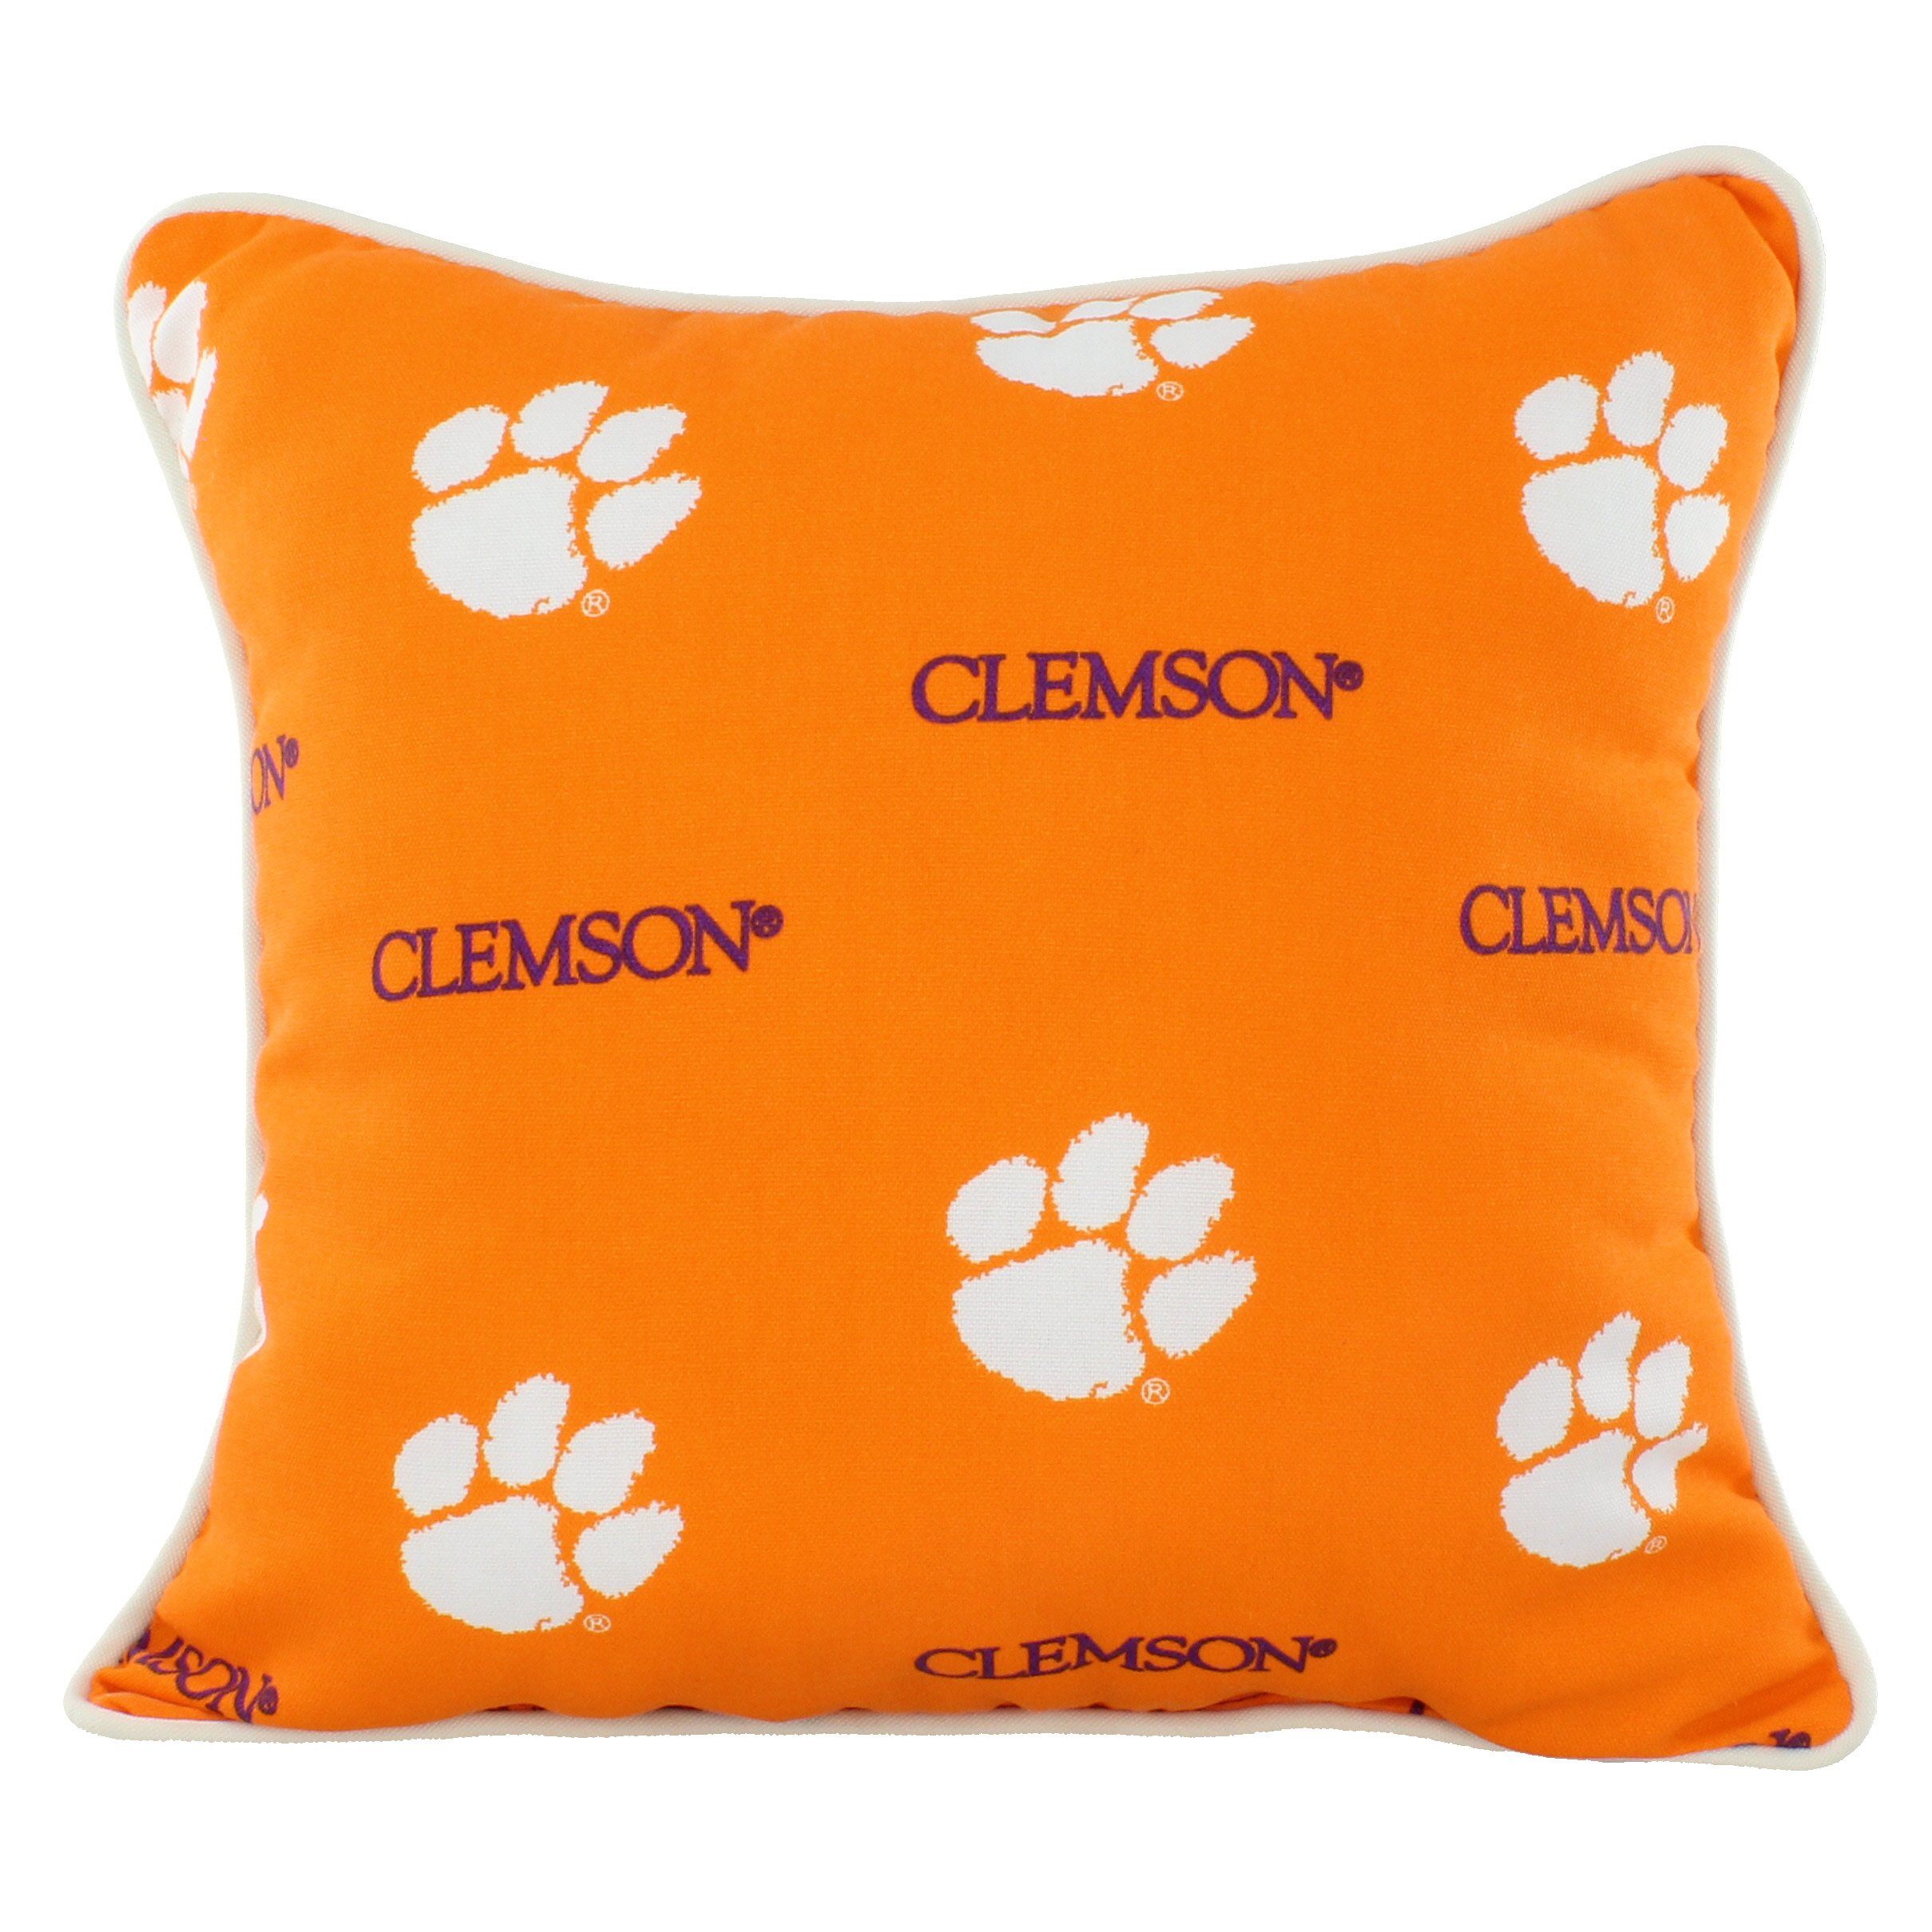 College Covers CLEODP Clemson Tigers Outdoor Decorative Pillow, 16'' x 16'', Orange